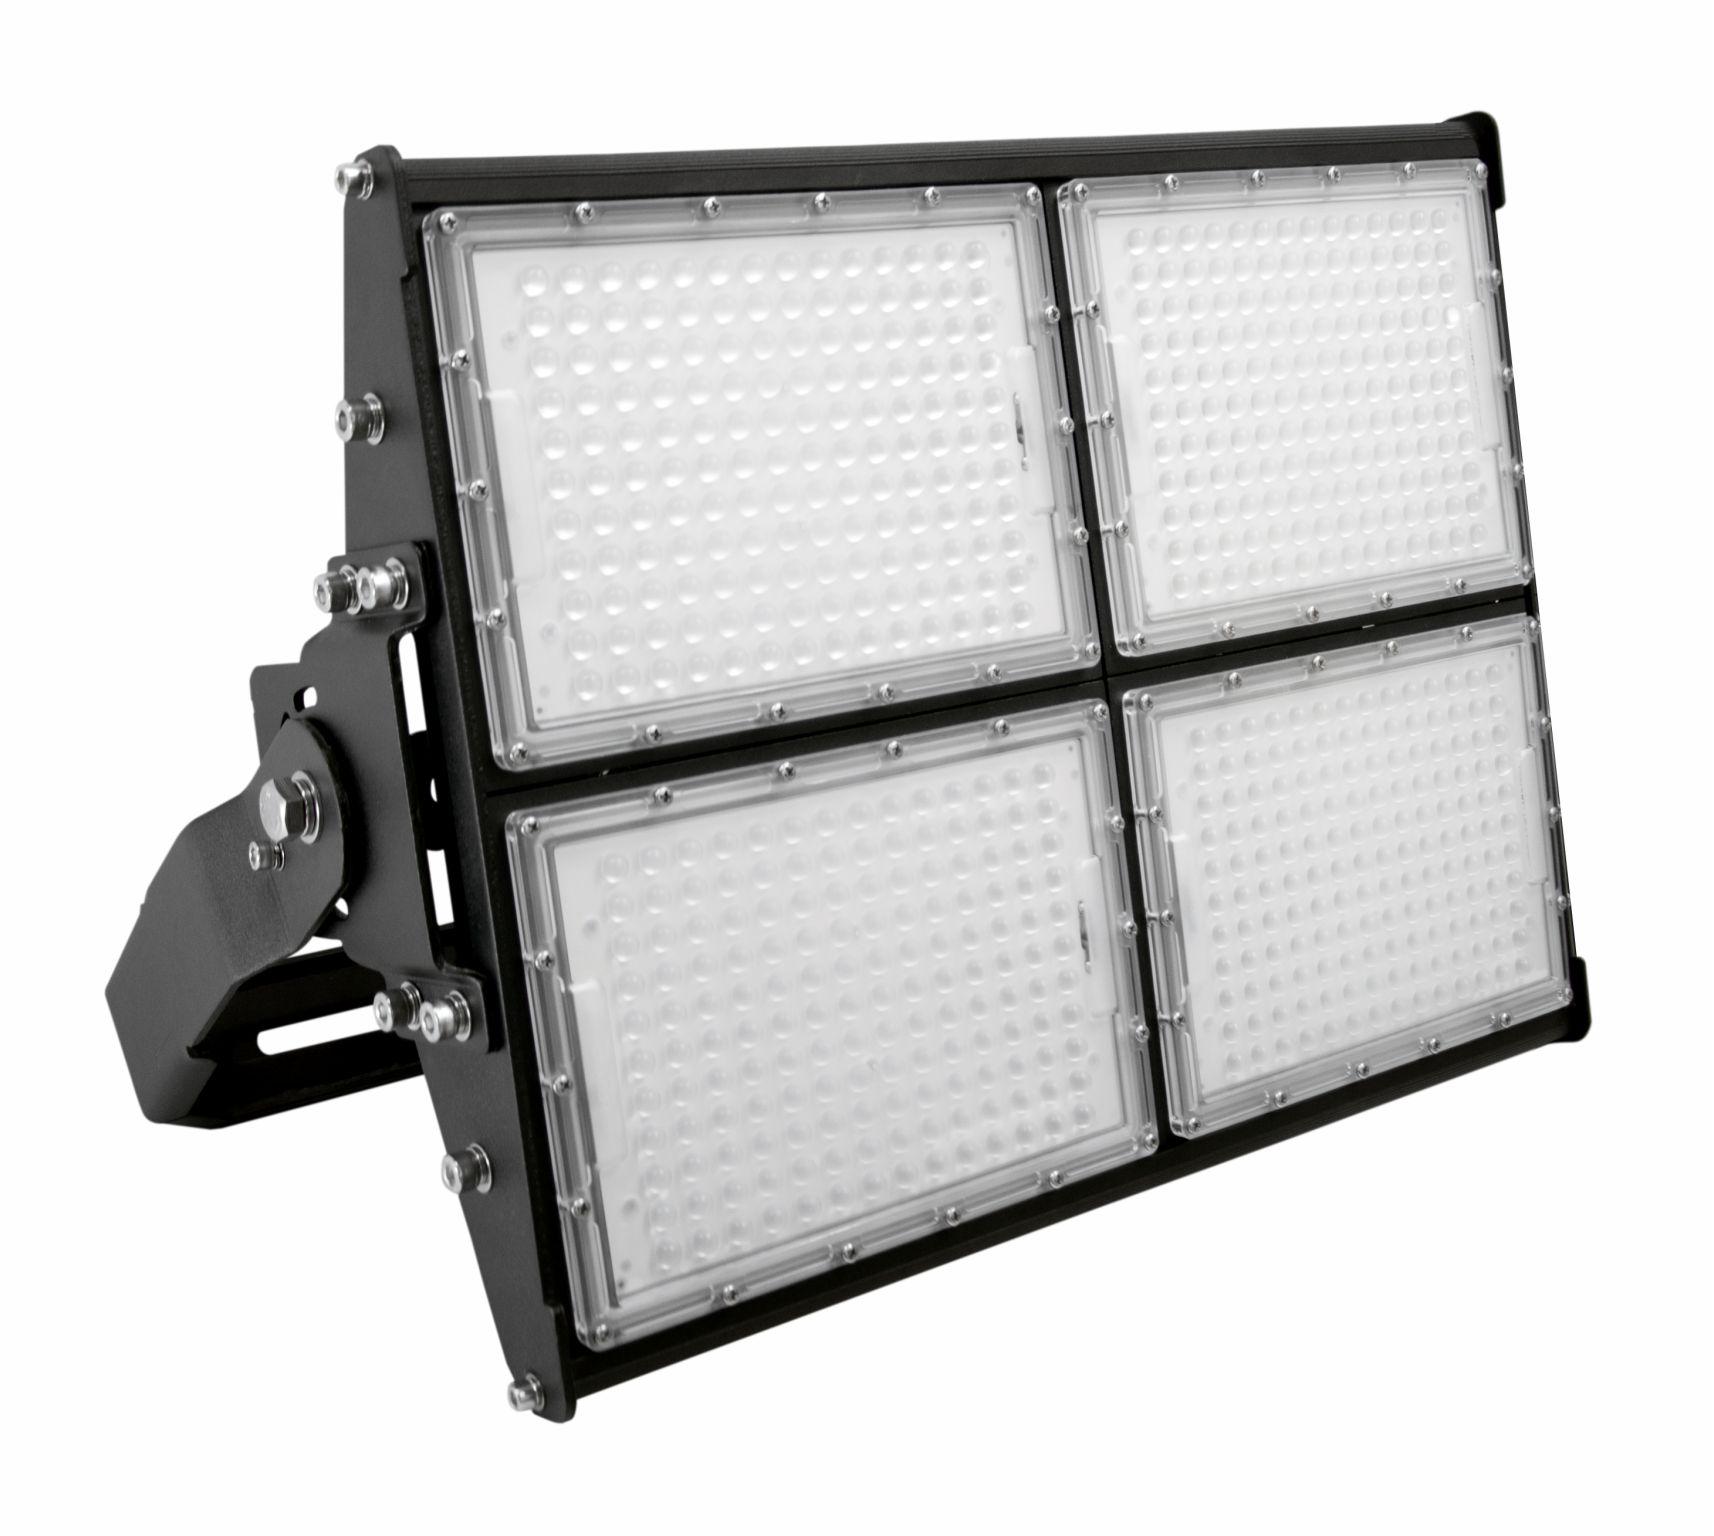 Refletor GT440 Modular LED 4x120W 5700K AUTOVOLT